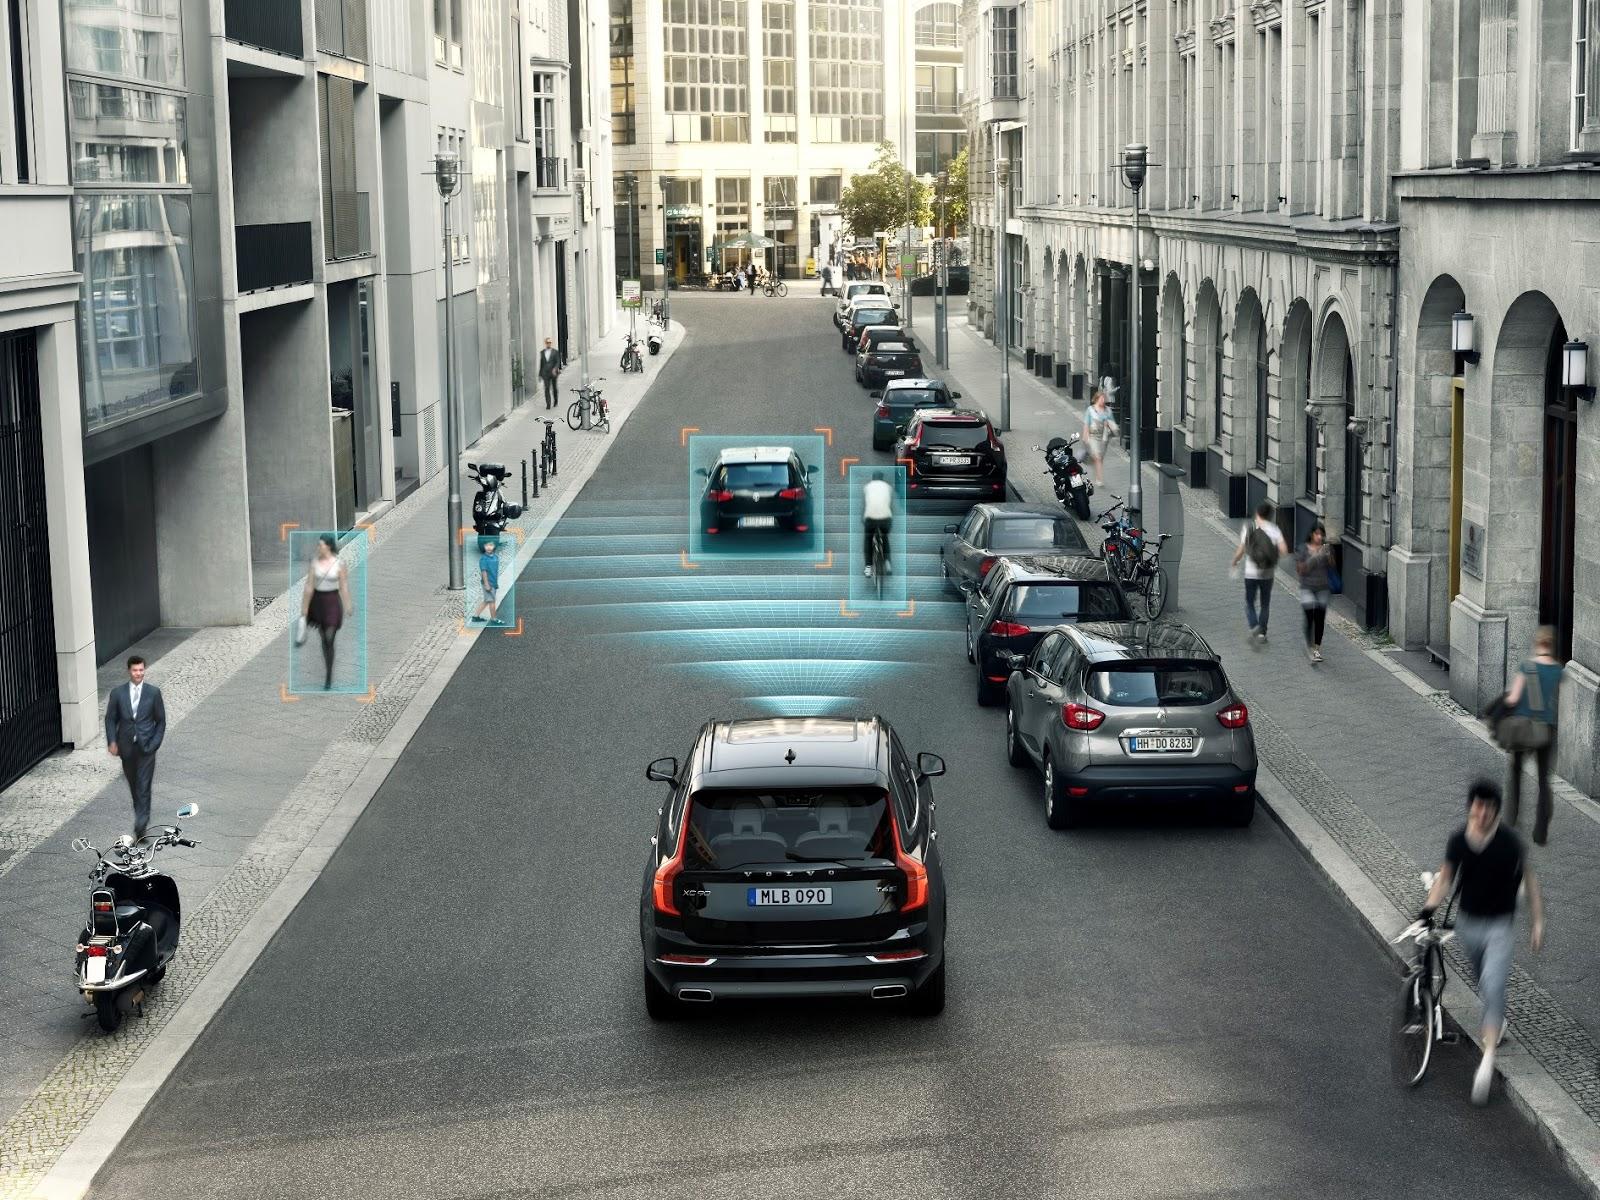 NEW%2BVOLVO%2BXC90 CITY%2BSAFETY H Volvo βάζει στόχο μηδέν θανάτους από τροχαία! Volvo, Volvo XC90